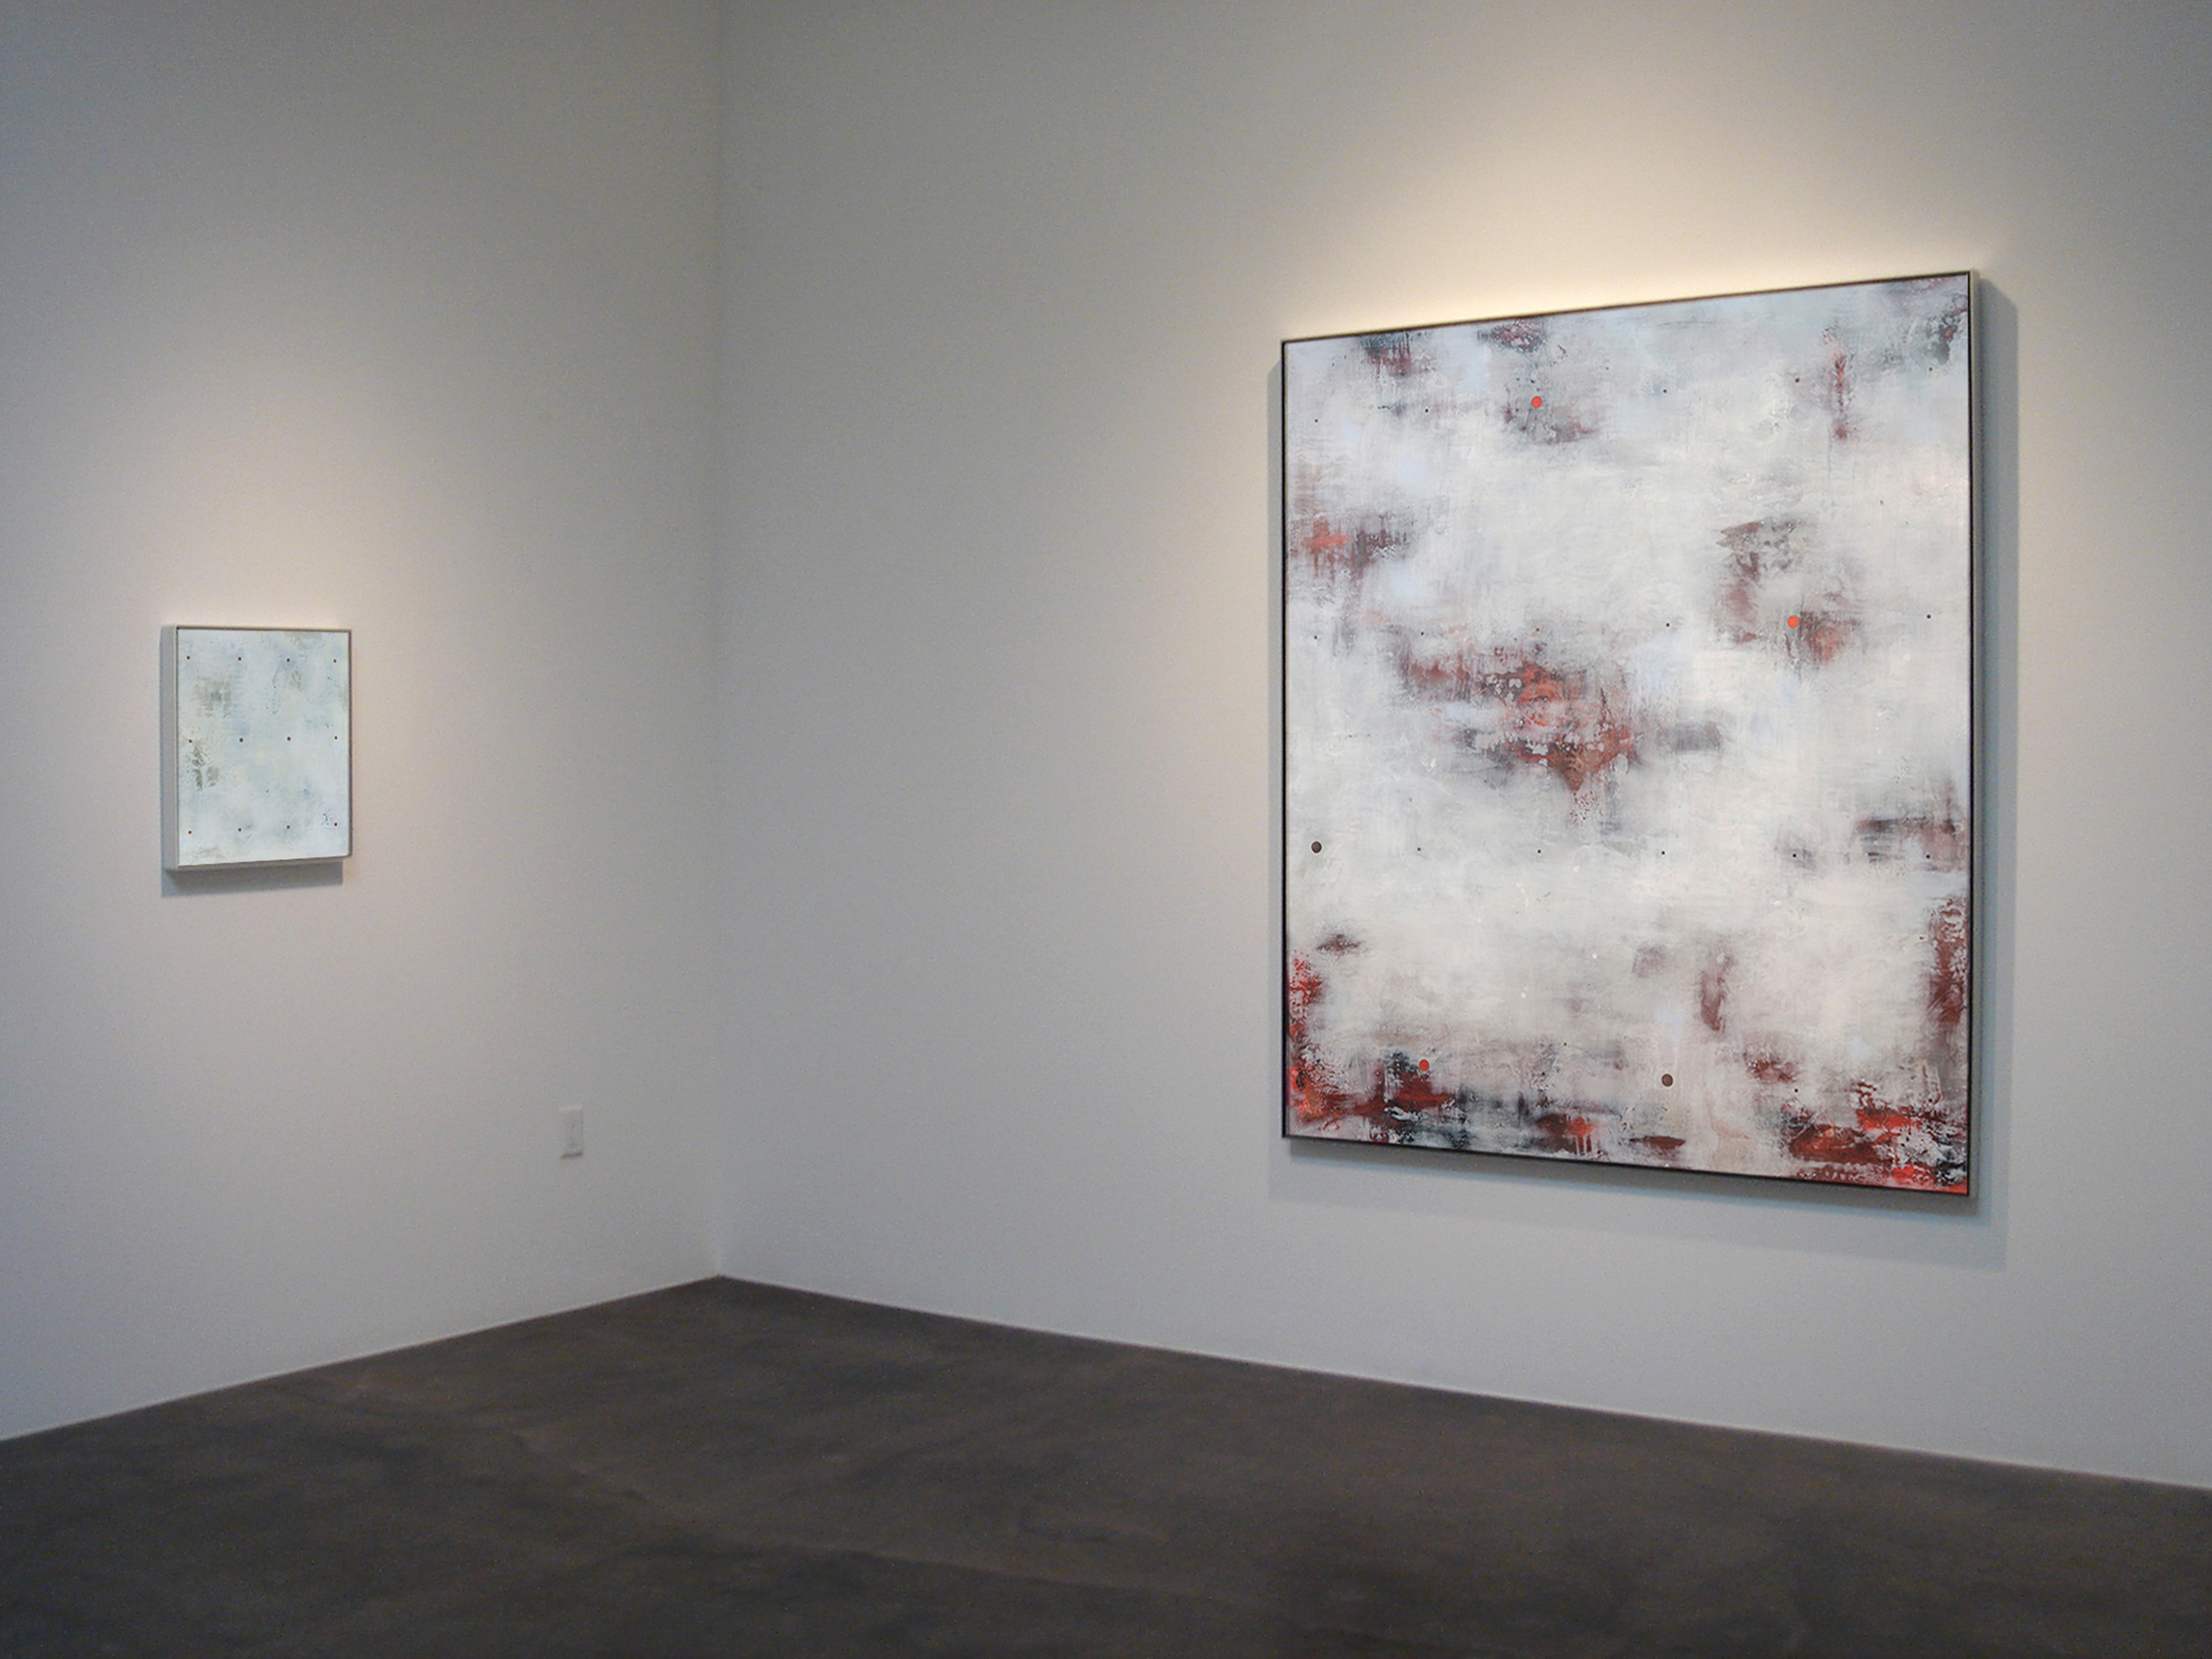 Holly Johnson Gallery